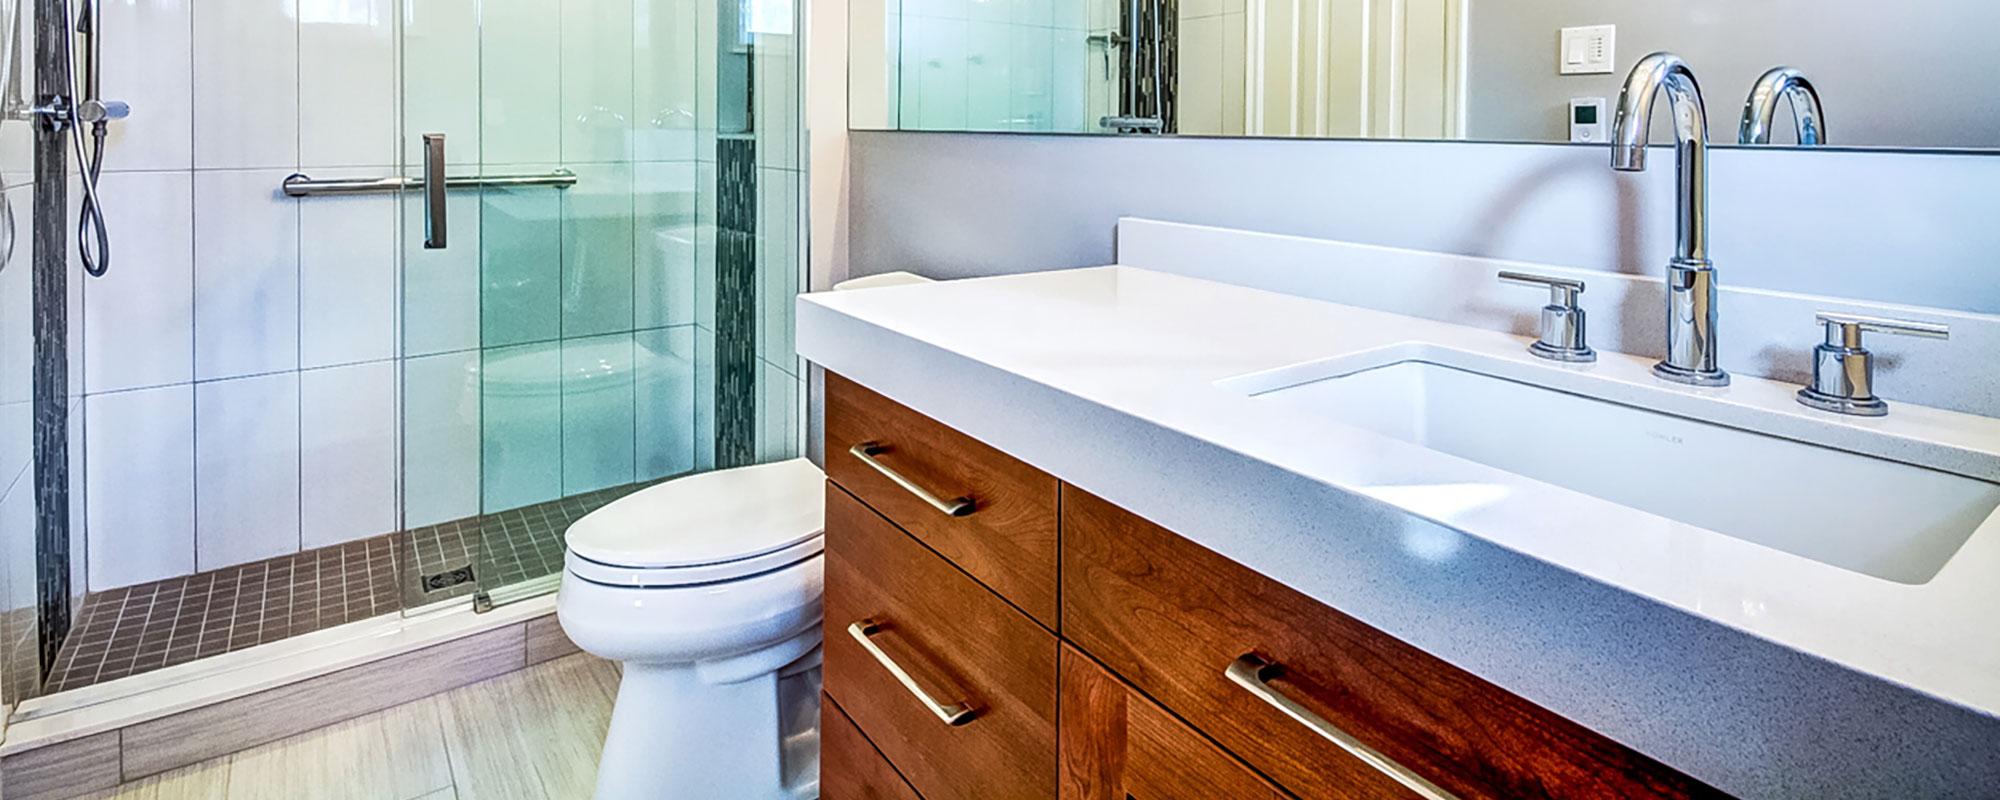 Tamarack Trail Family Bathroom and Ensuite Bathroom Renovation